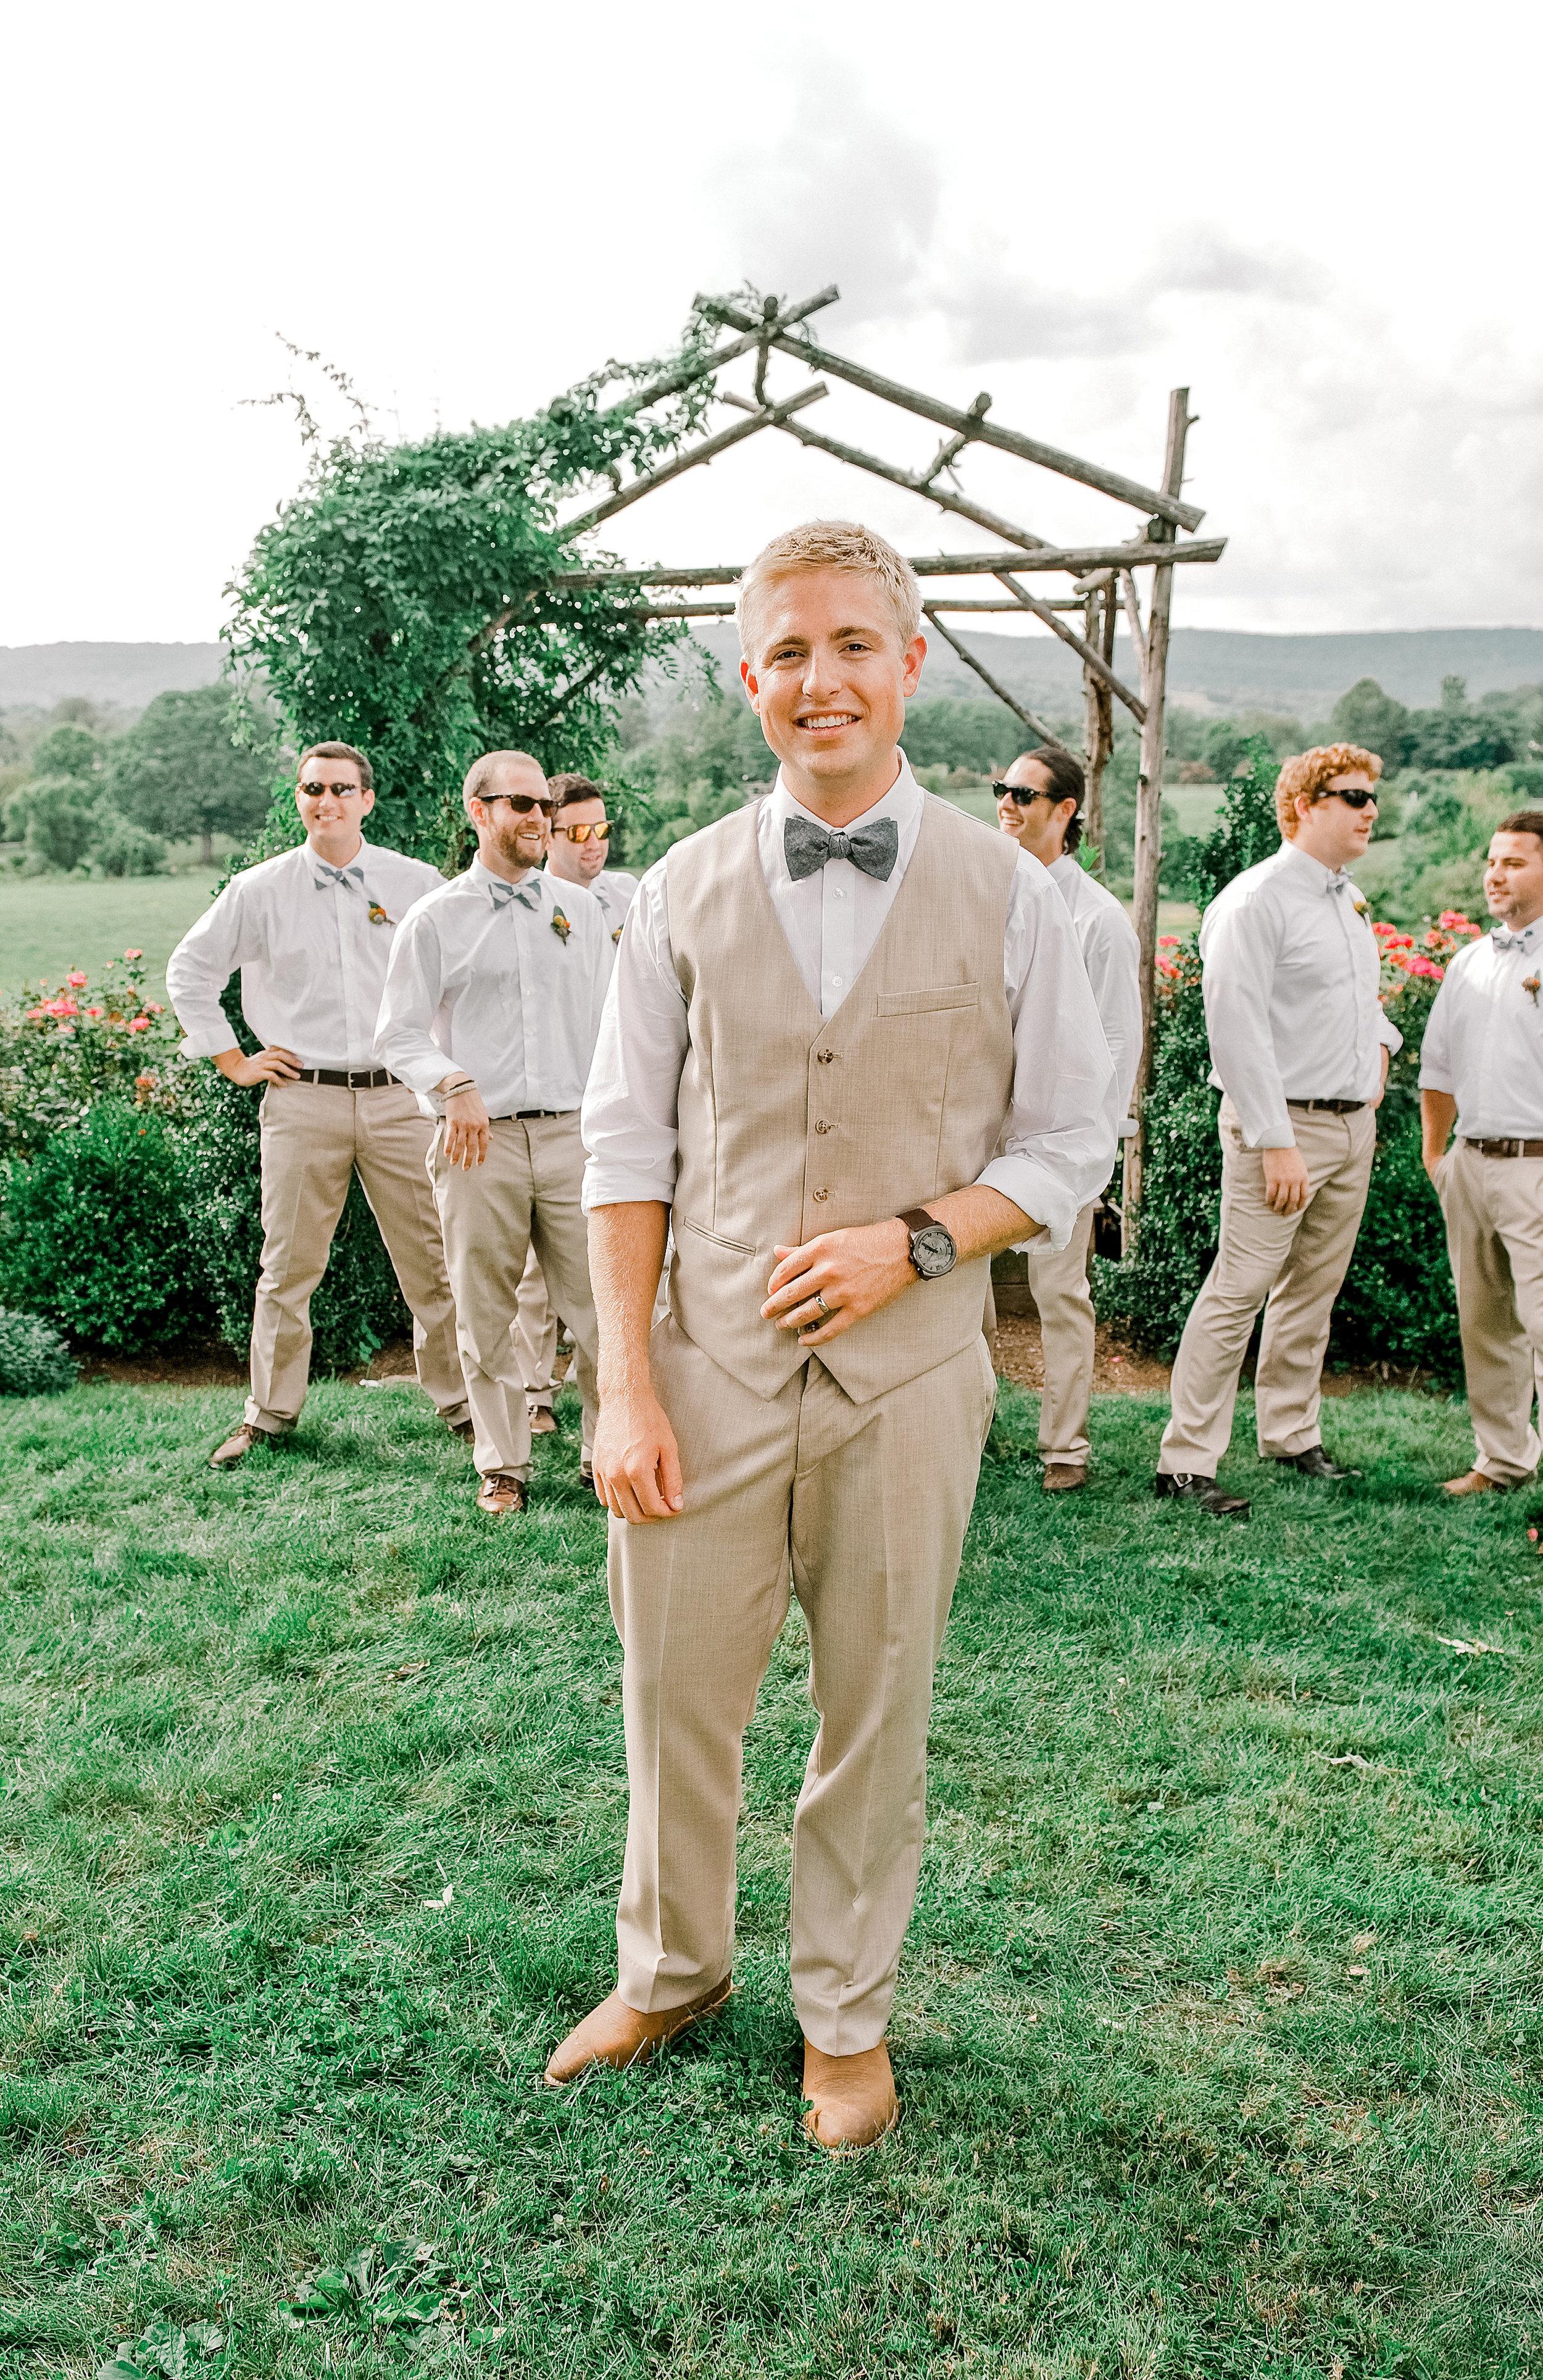 Silverbrook-Farm-Weddings-Virginia-26.jpg